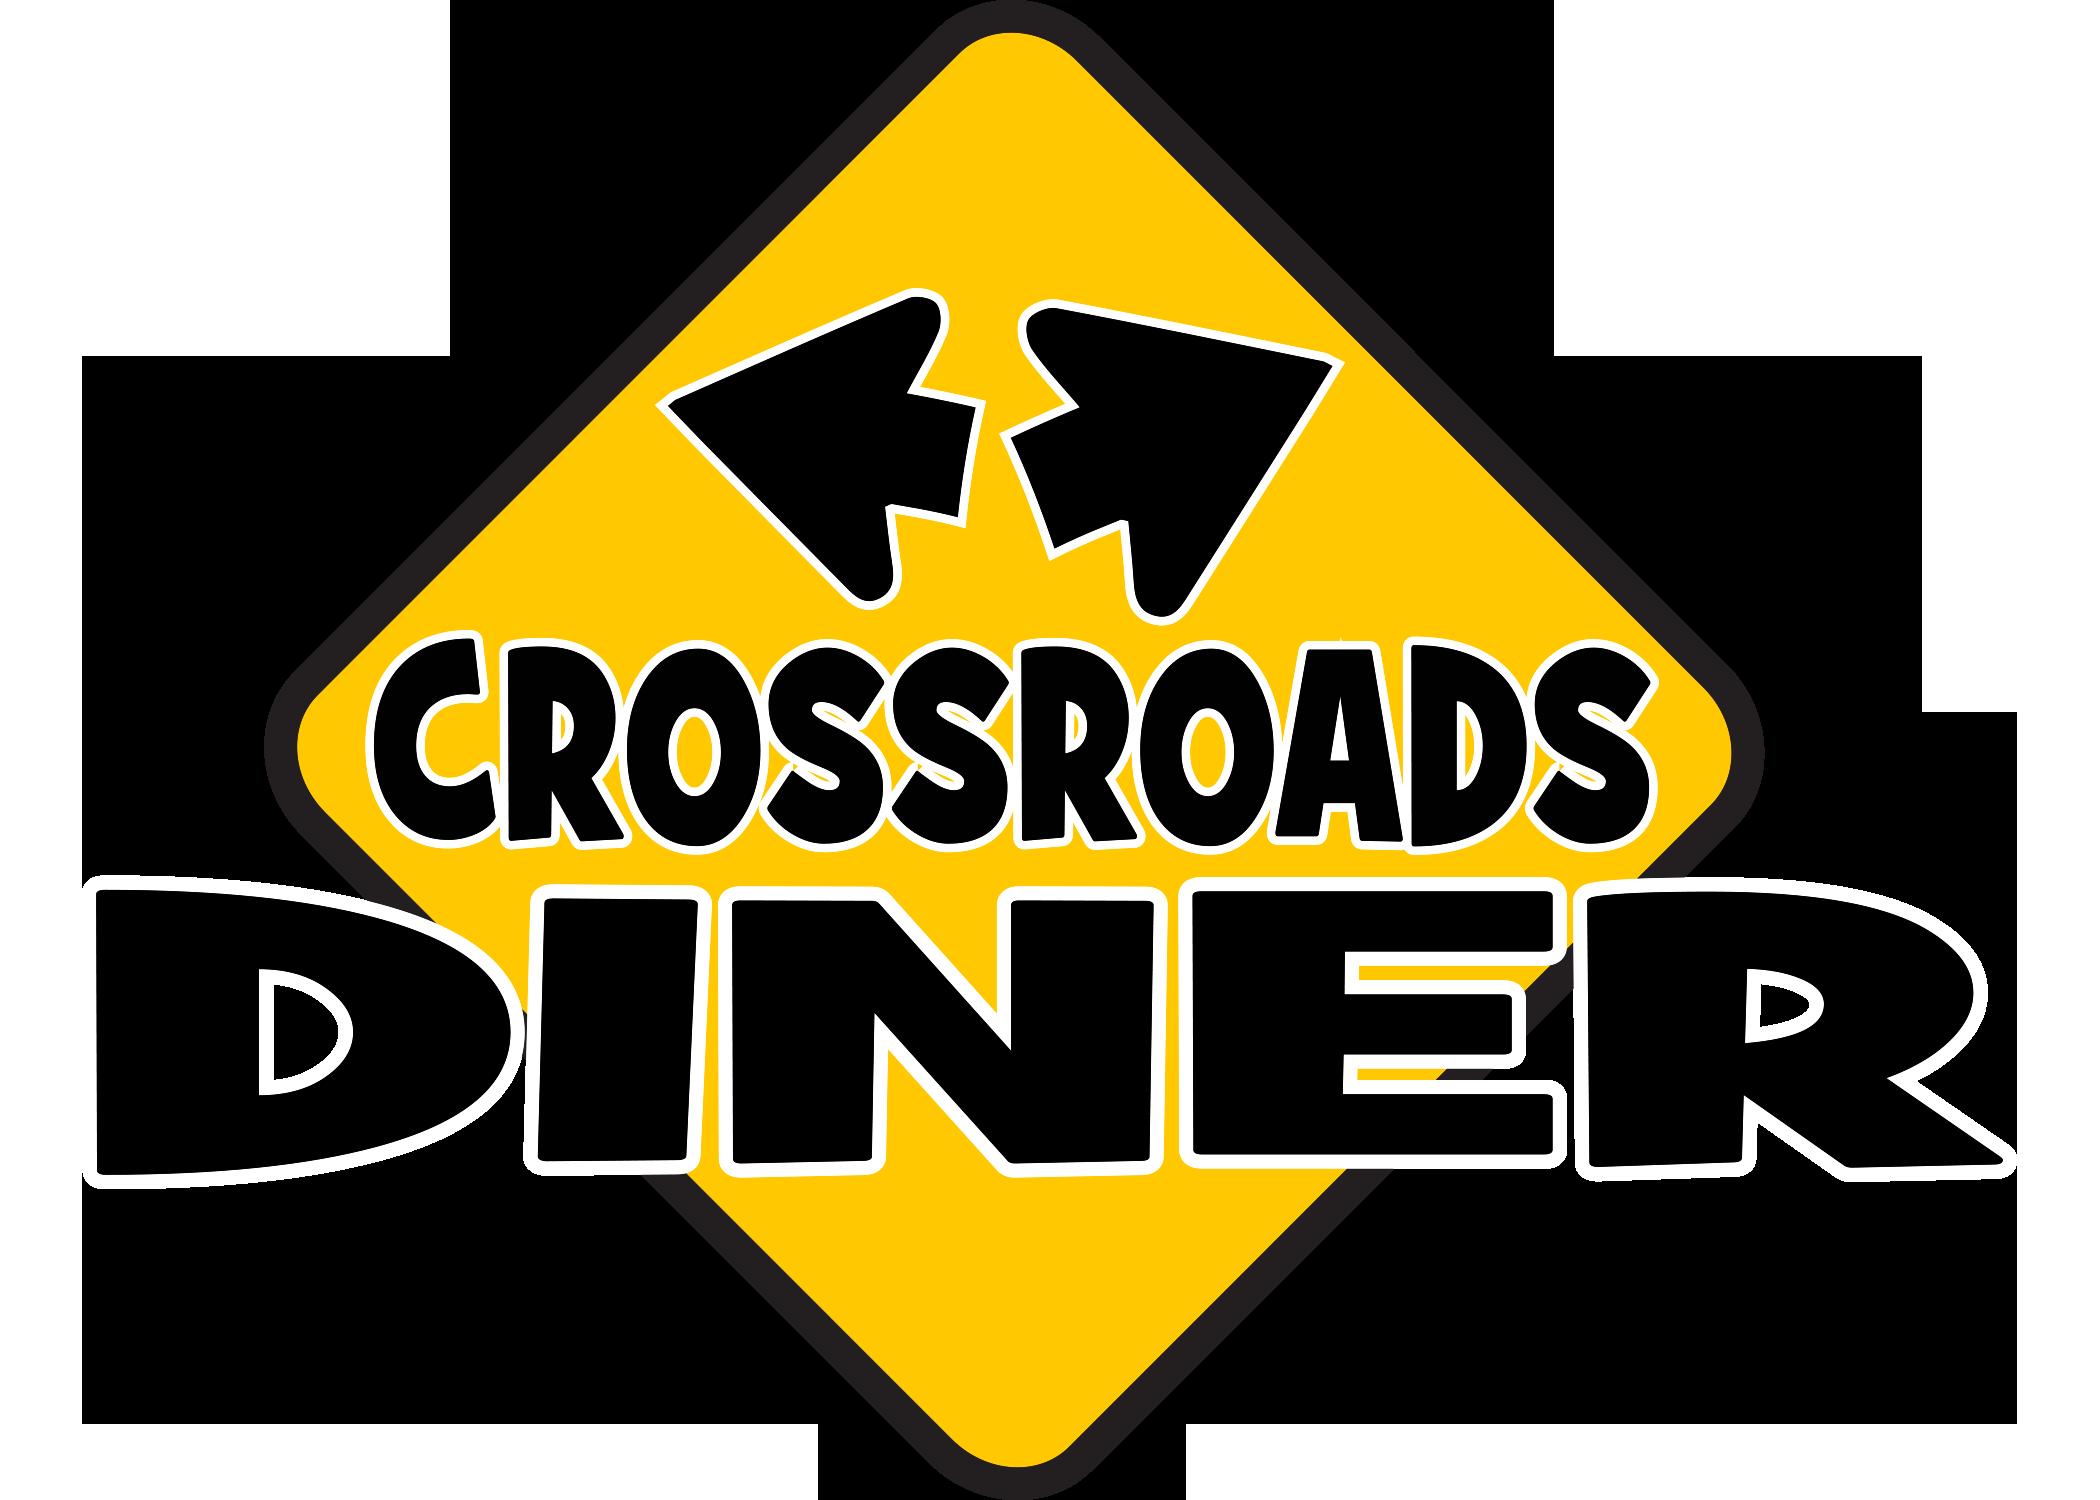 Diner clipart restaurant sign. Bethel me crossroads follow